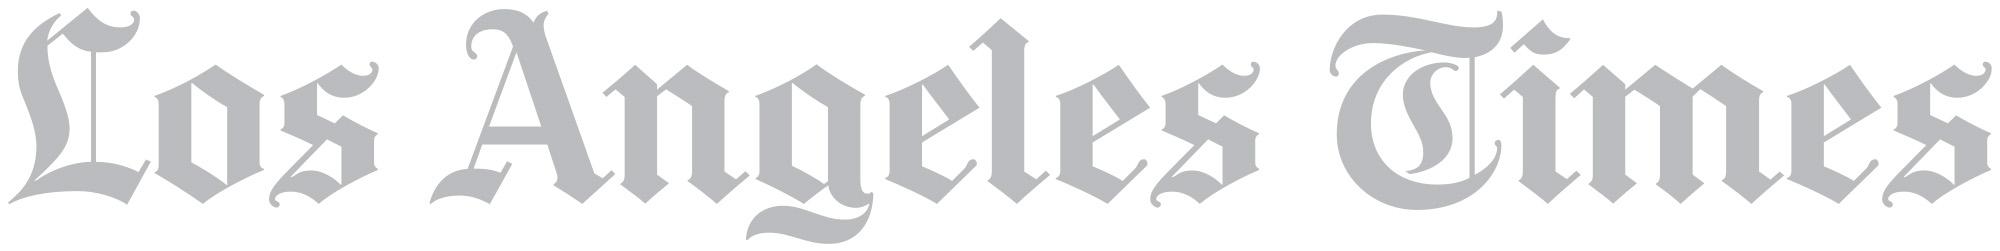 2000px-Los_Angeles_Times_logo-Edited